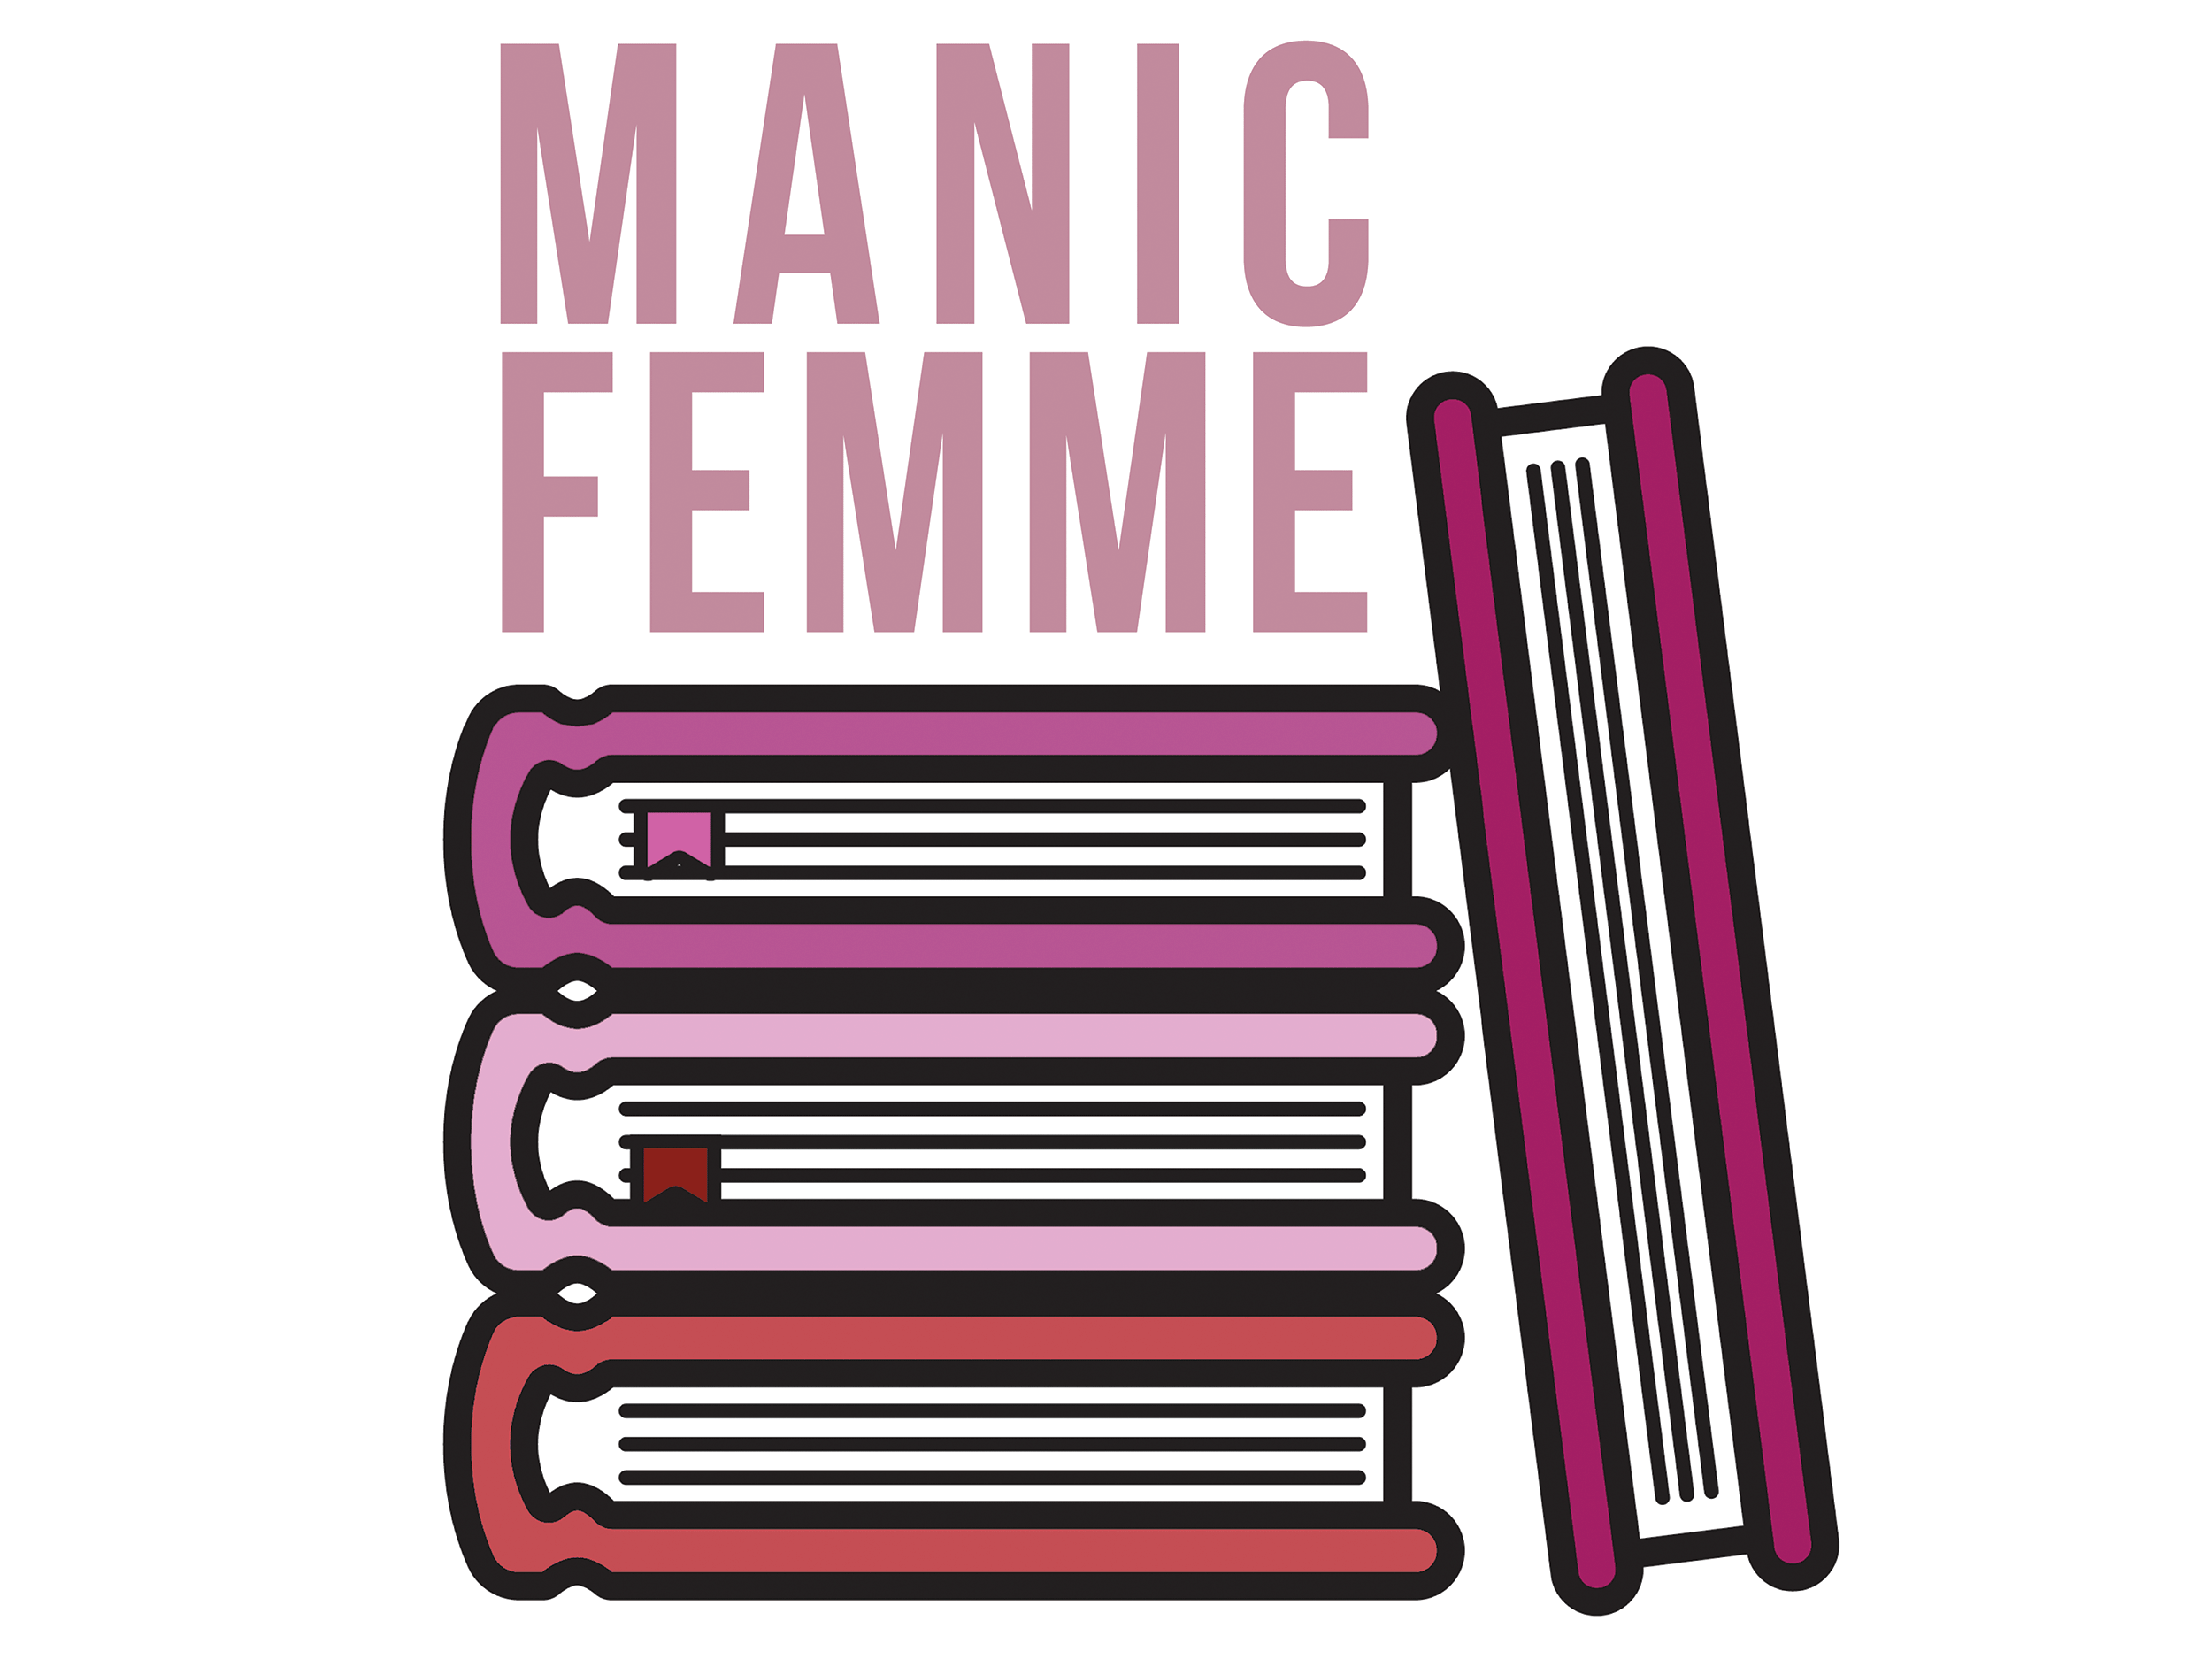 manic femme reviews